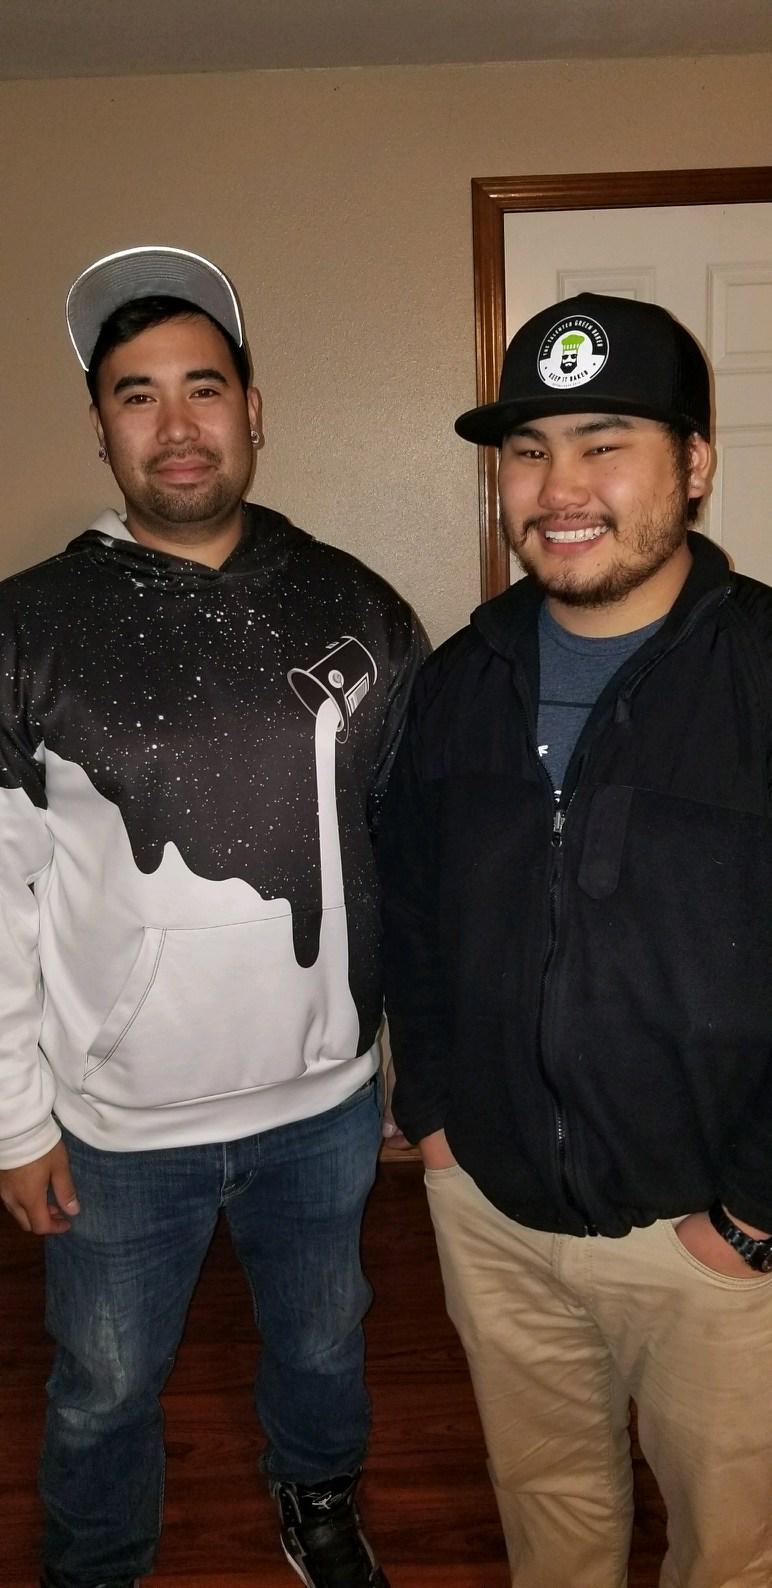 Cousins, and fellow military veterans, Antonino DePeralta (left) and Steve Nguyen (right)